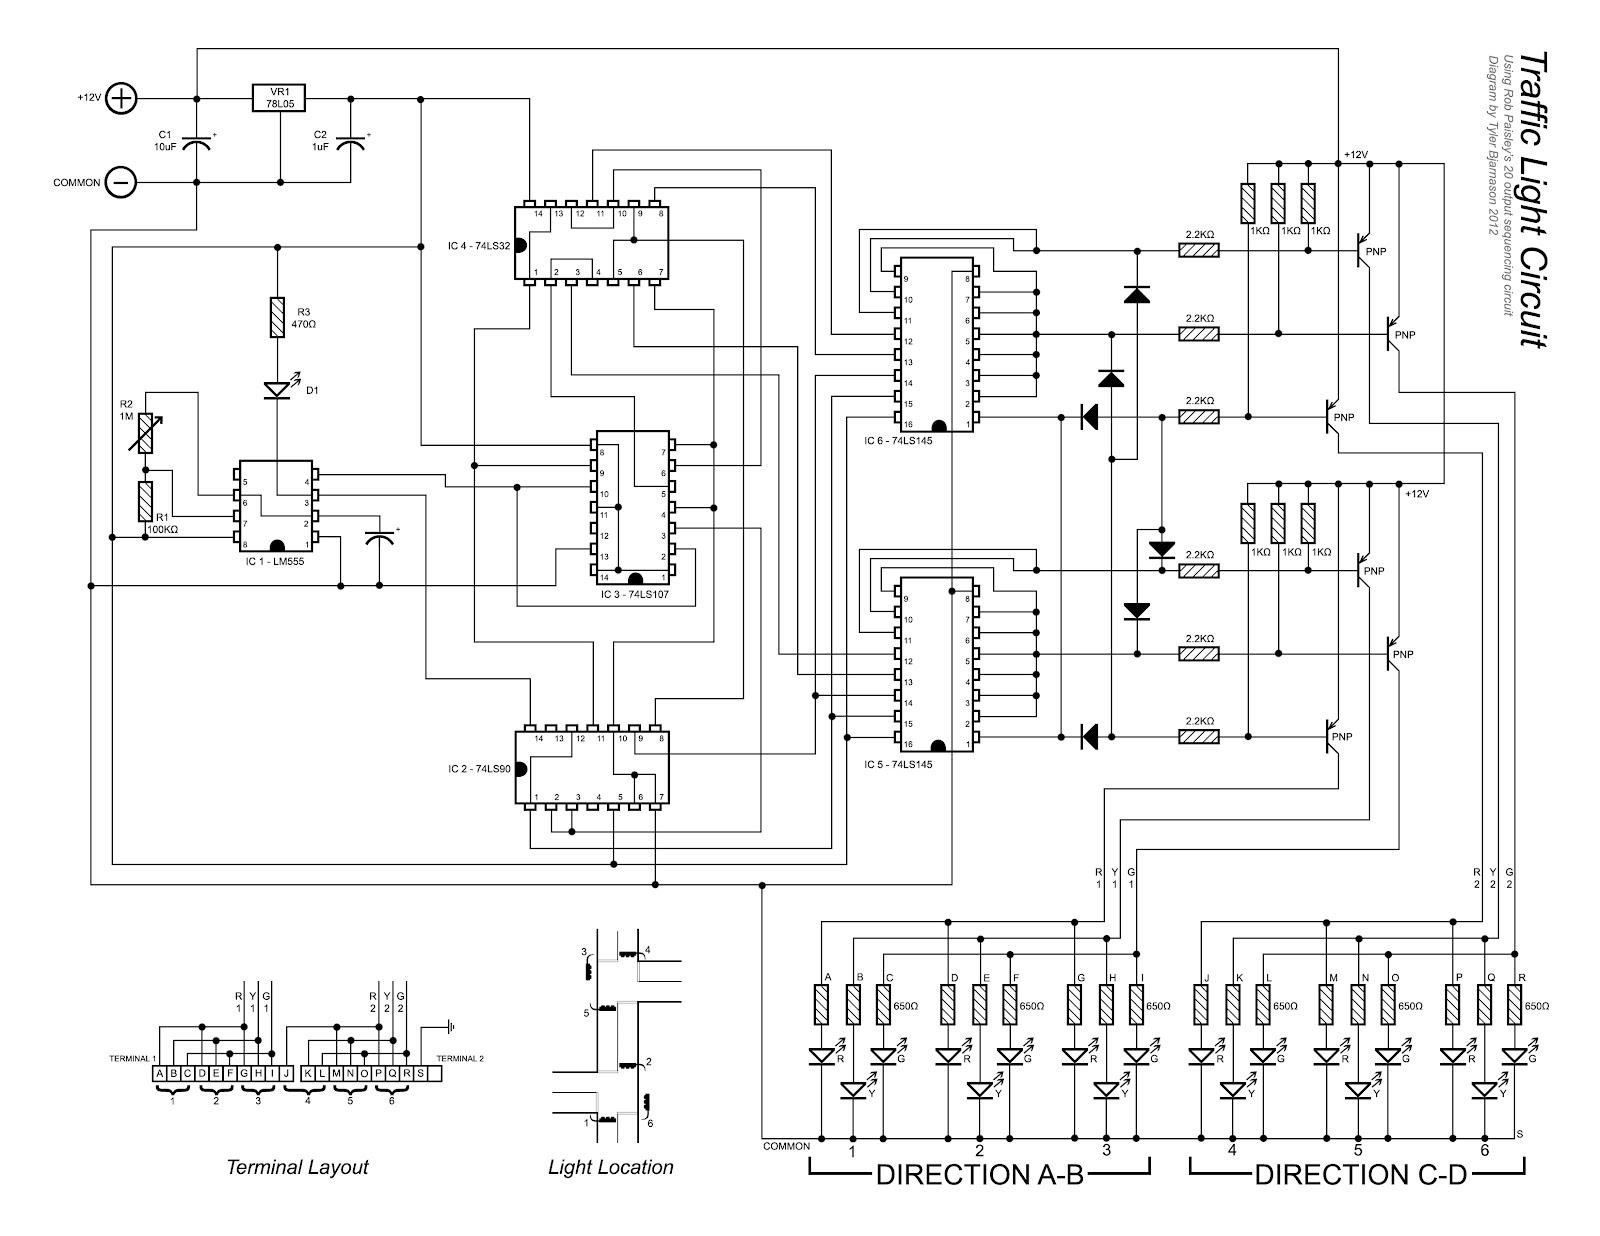 Traffic Light Wiring Diagram